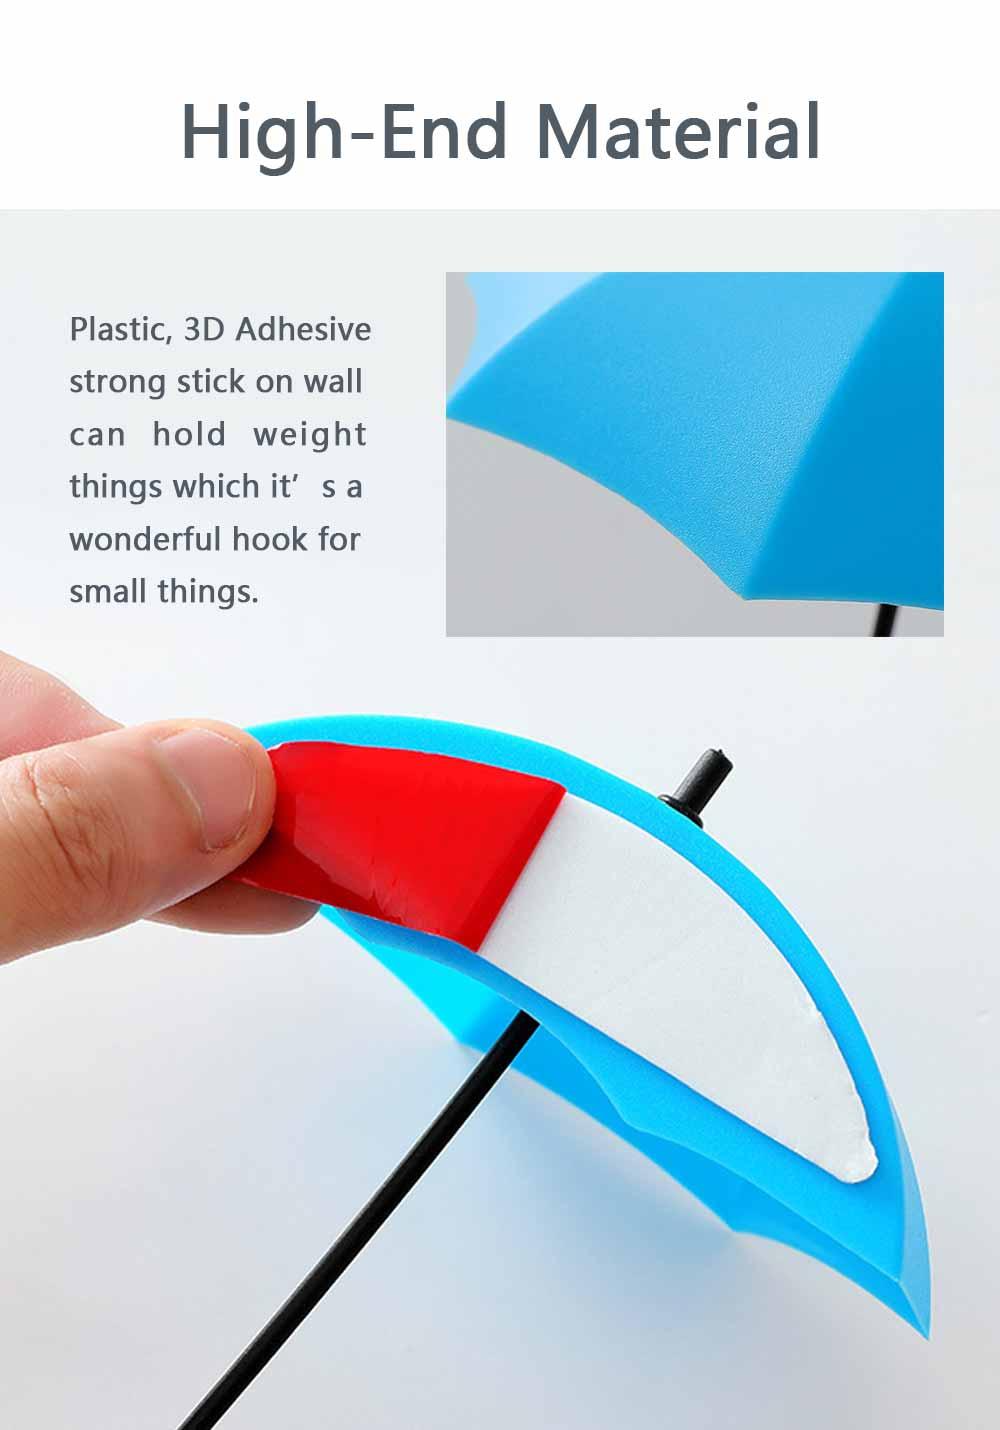 Umbrella Wall Hooks, Cute Little Sticky Hanging Hooks for Hat Purse Key Storage (3 packs) 2